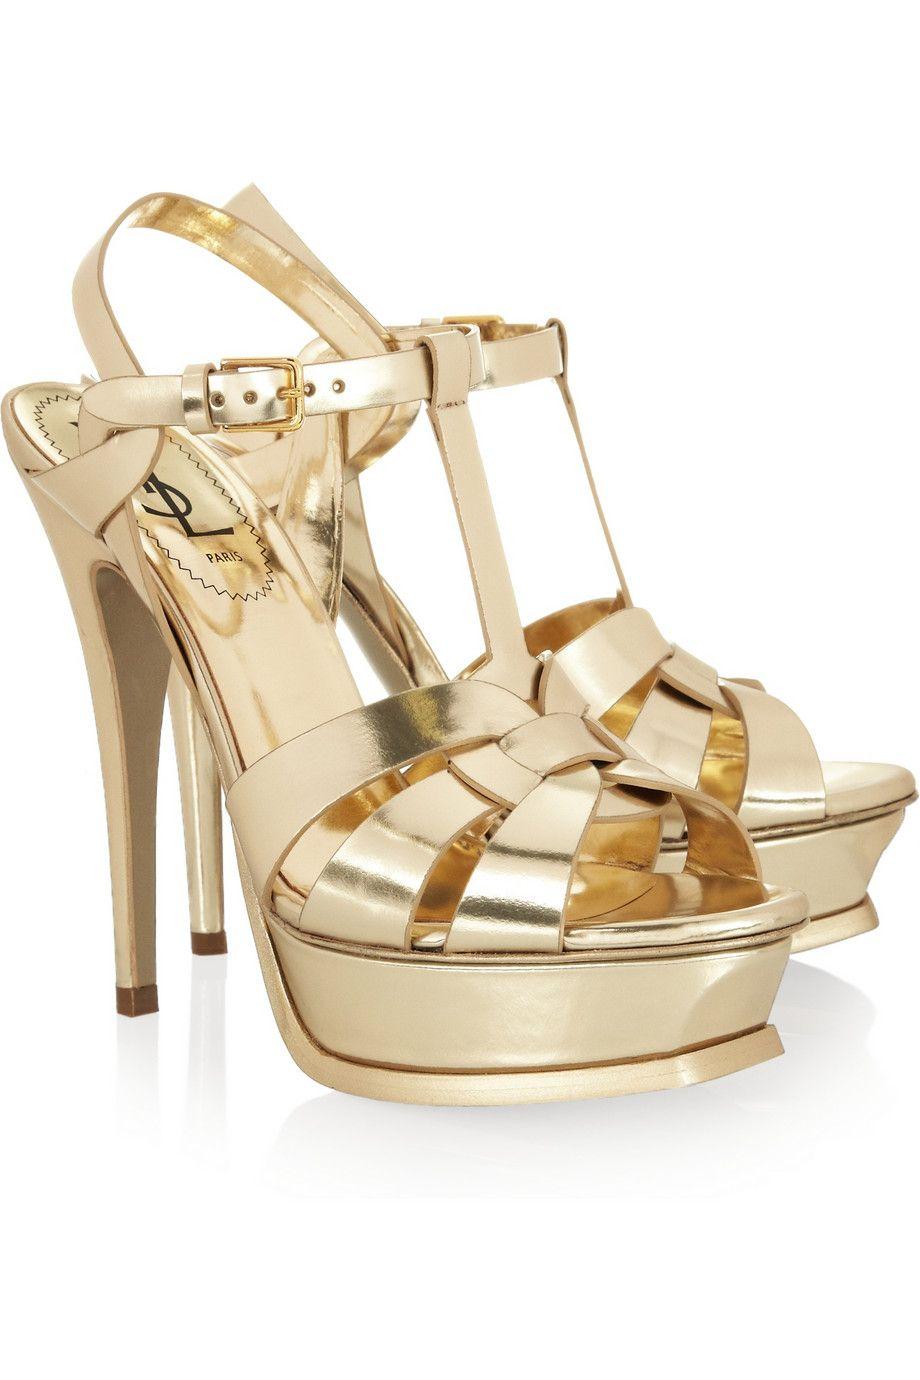 Ysl sandals shoes - Yves Saint Laurent All Gold Err Thang Gold Sandalsleather Sandalsshoes